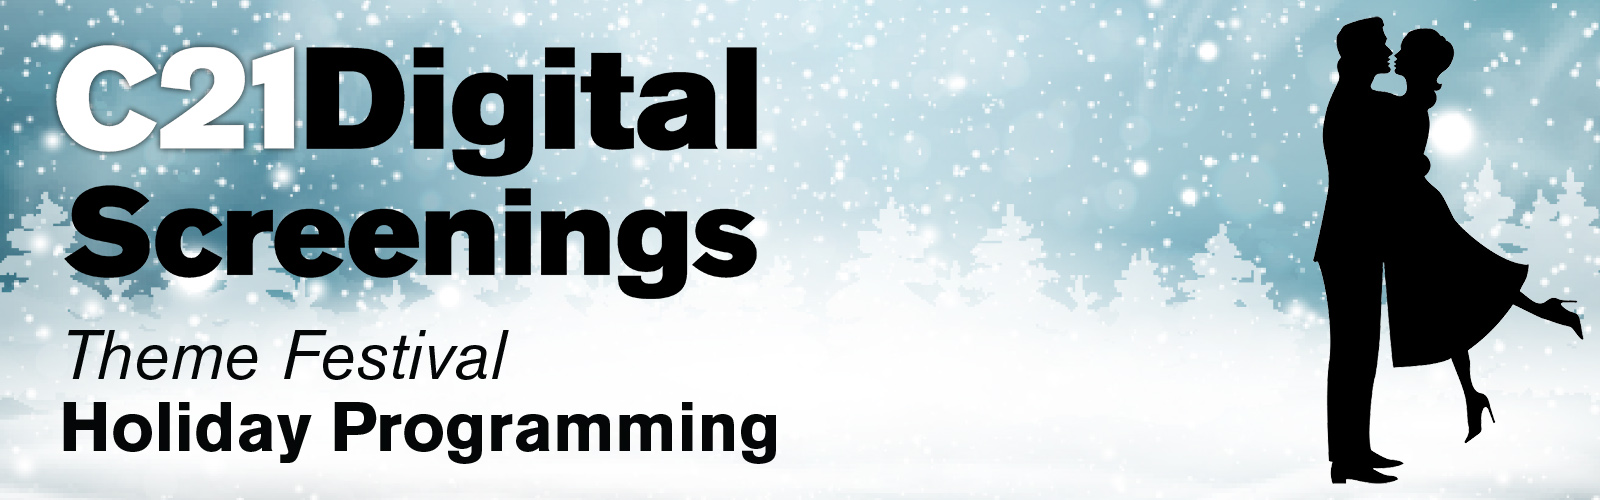 Theme Festival - Holiday Programming